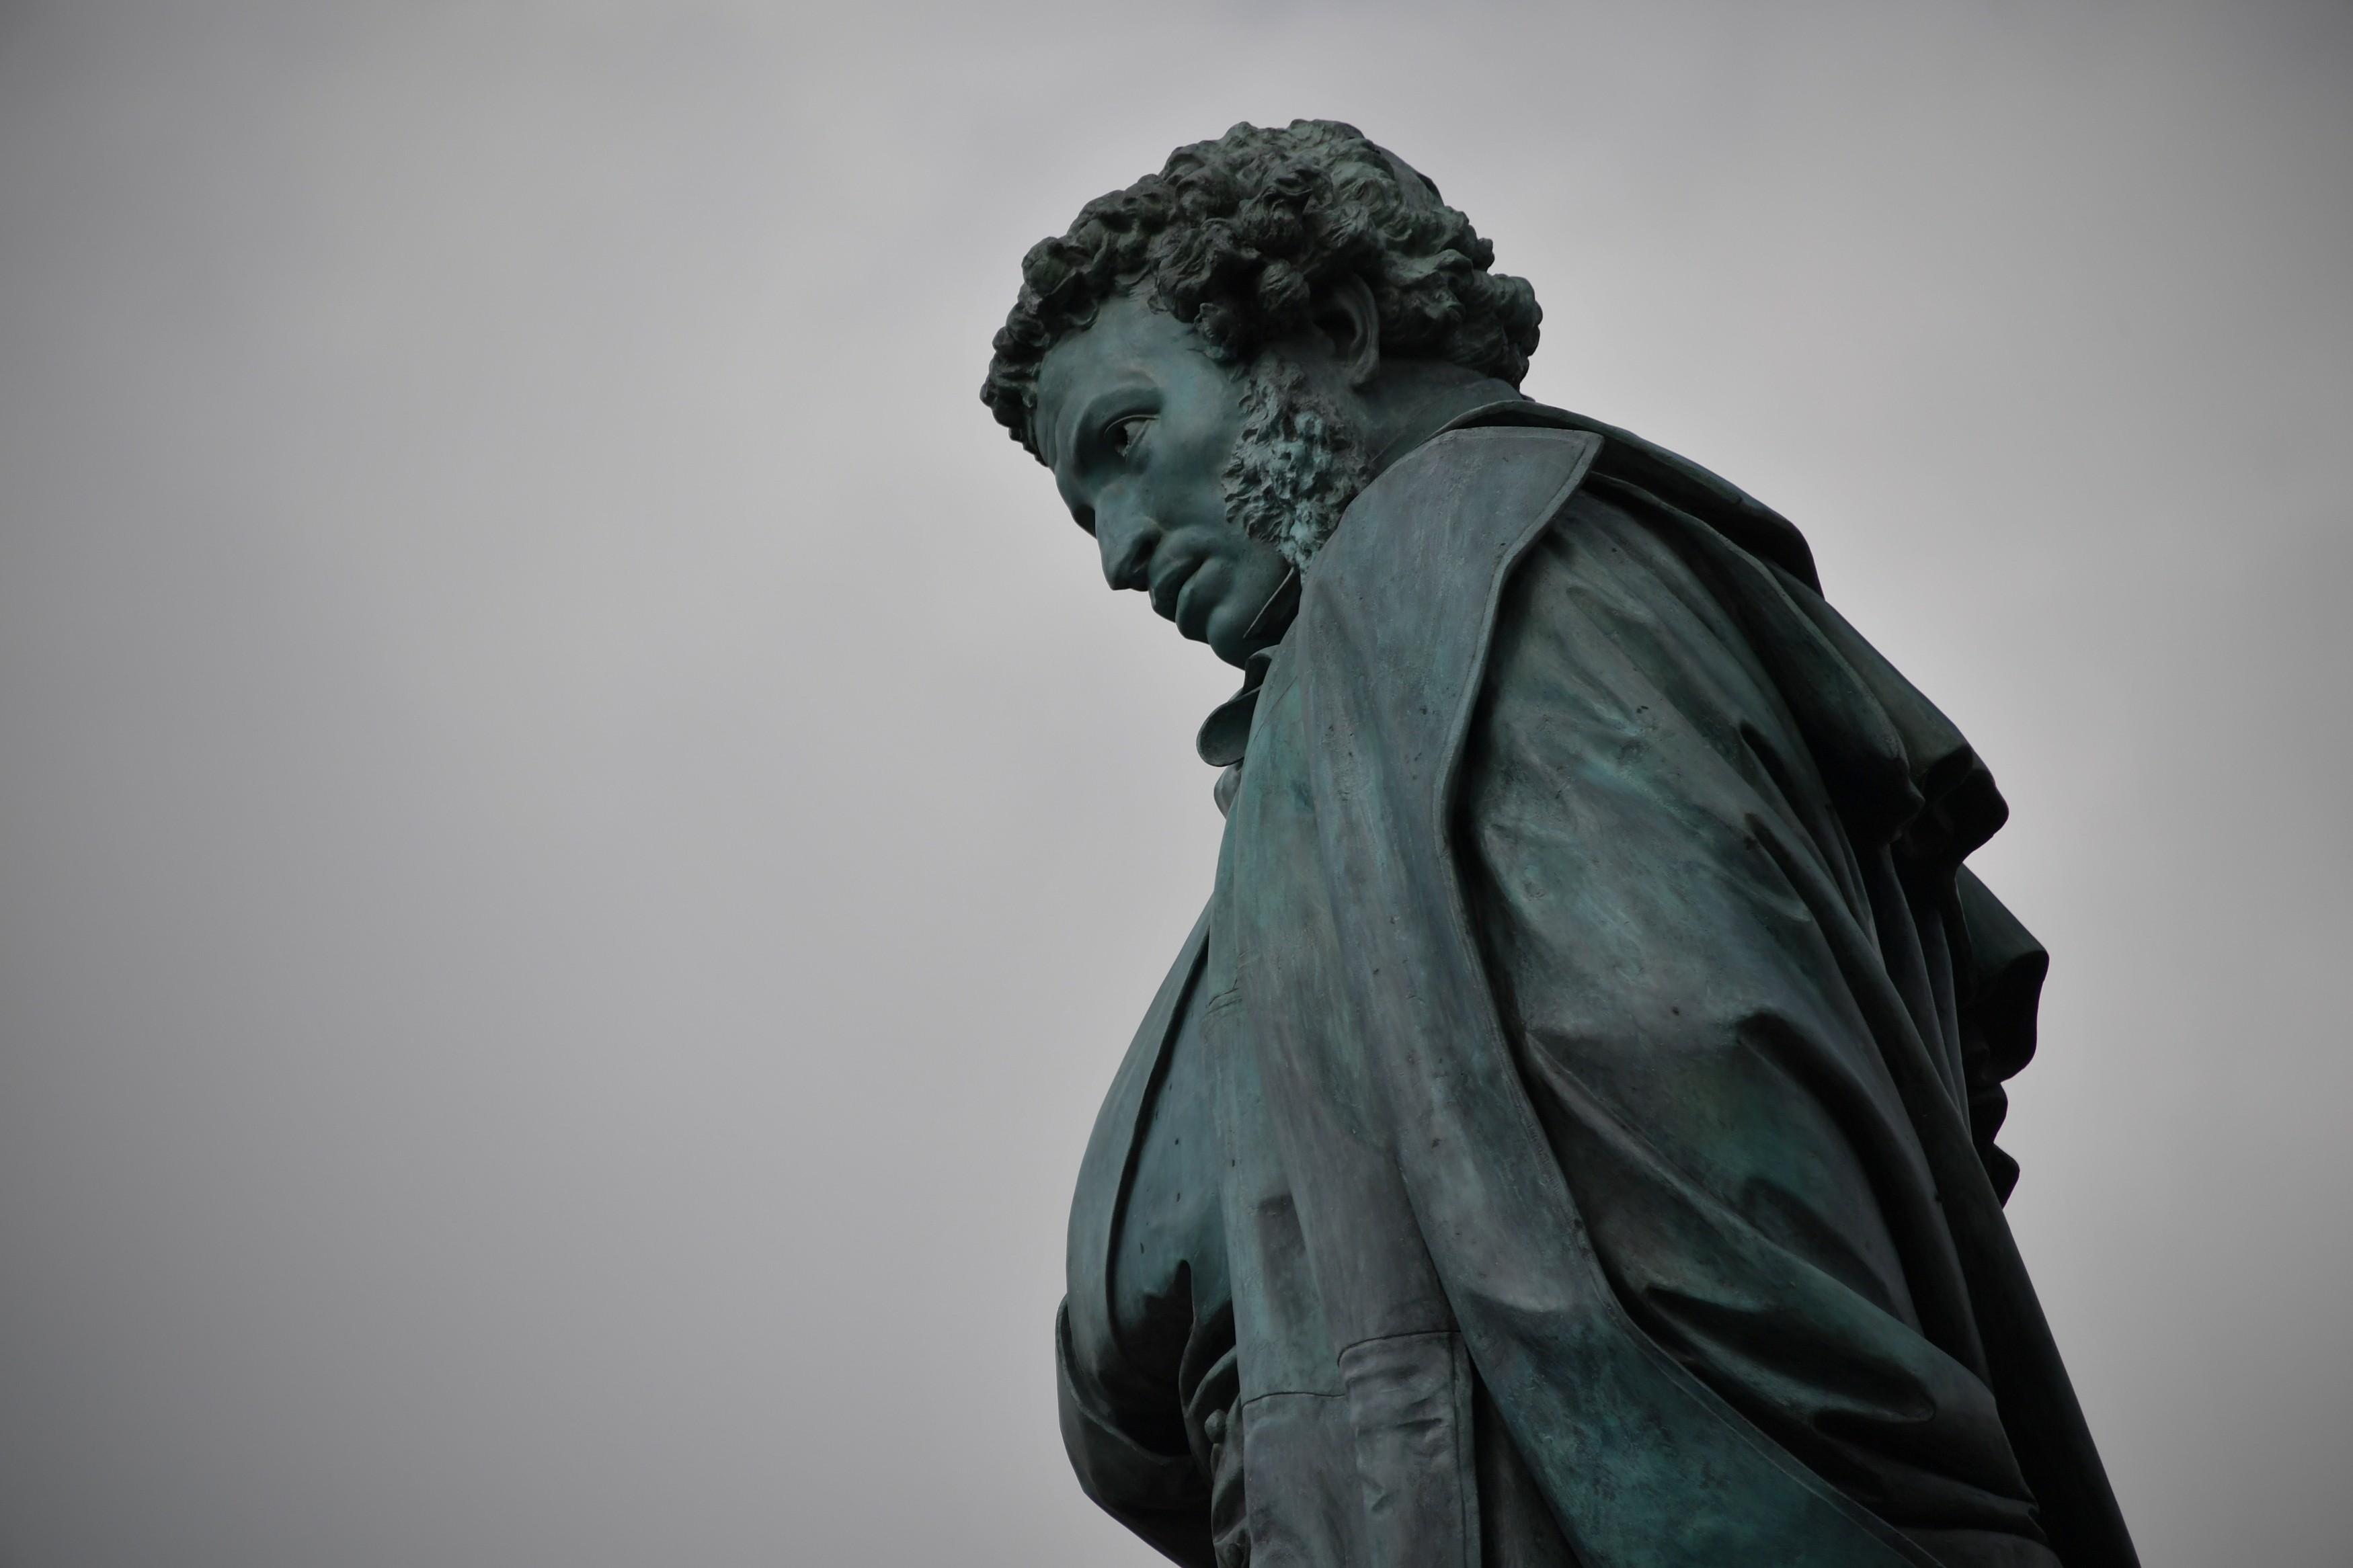 Памятник Александру Пушкину в Санкт-Петербурге